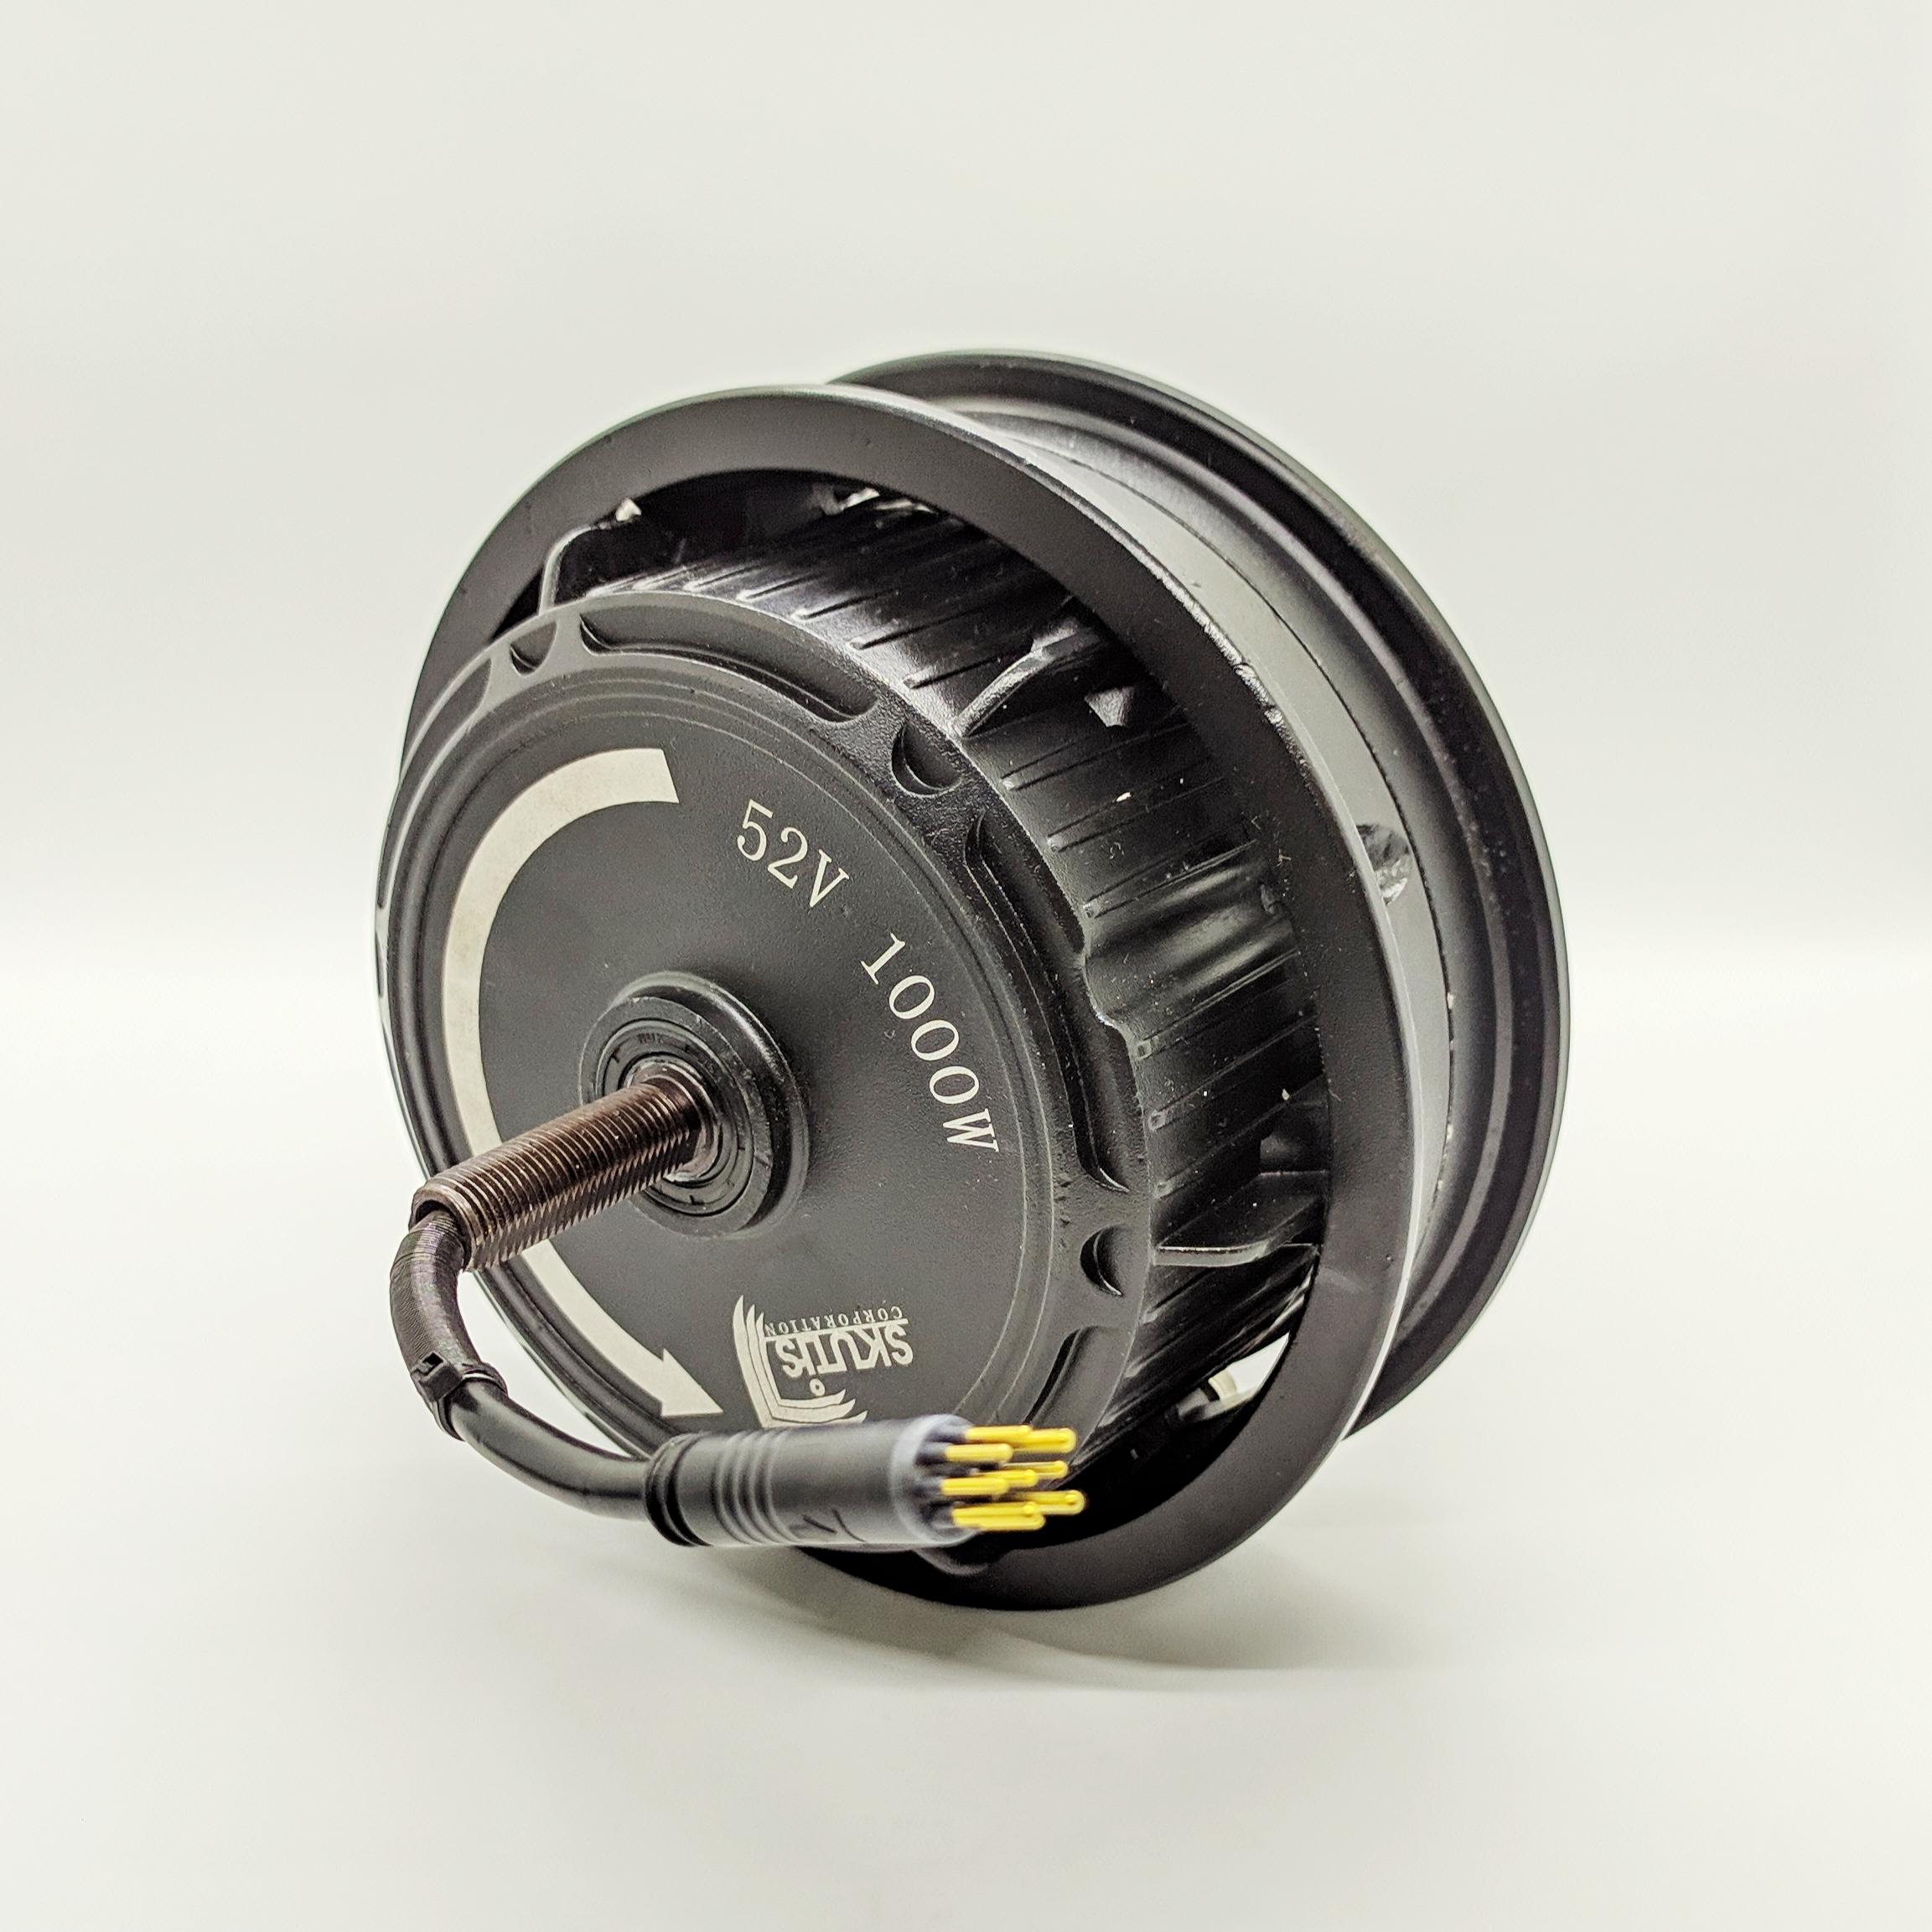 IMG 20200416 161850 - Anoa Ex+ 1000W Motor